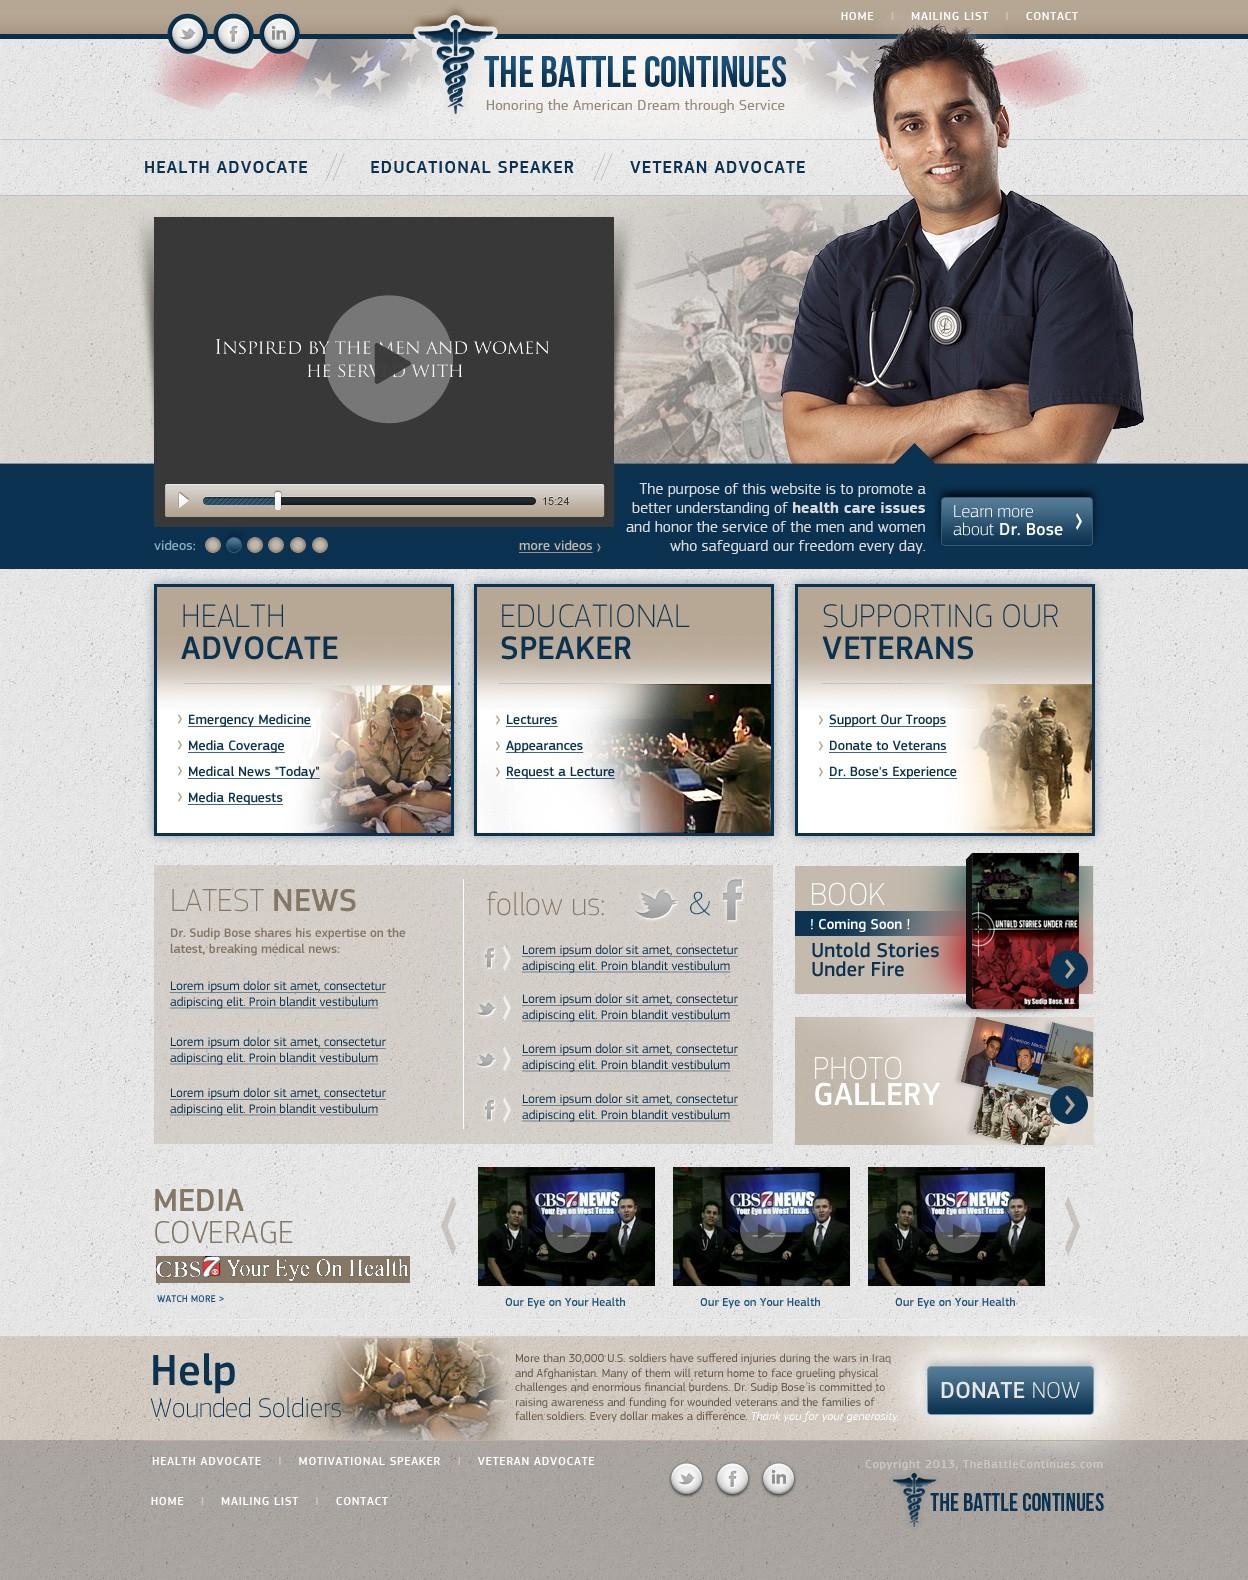 website design for TheBattleContinues.org